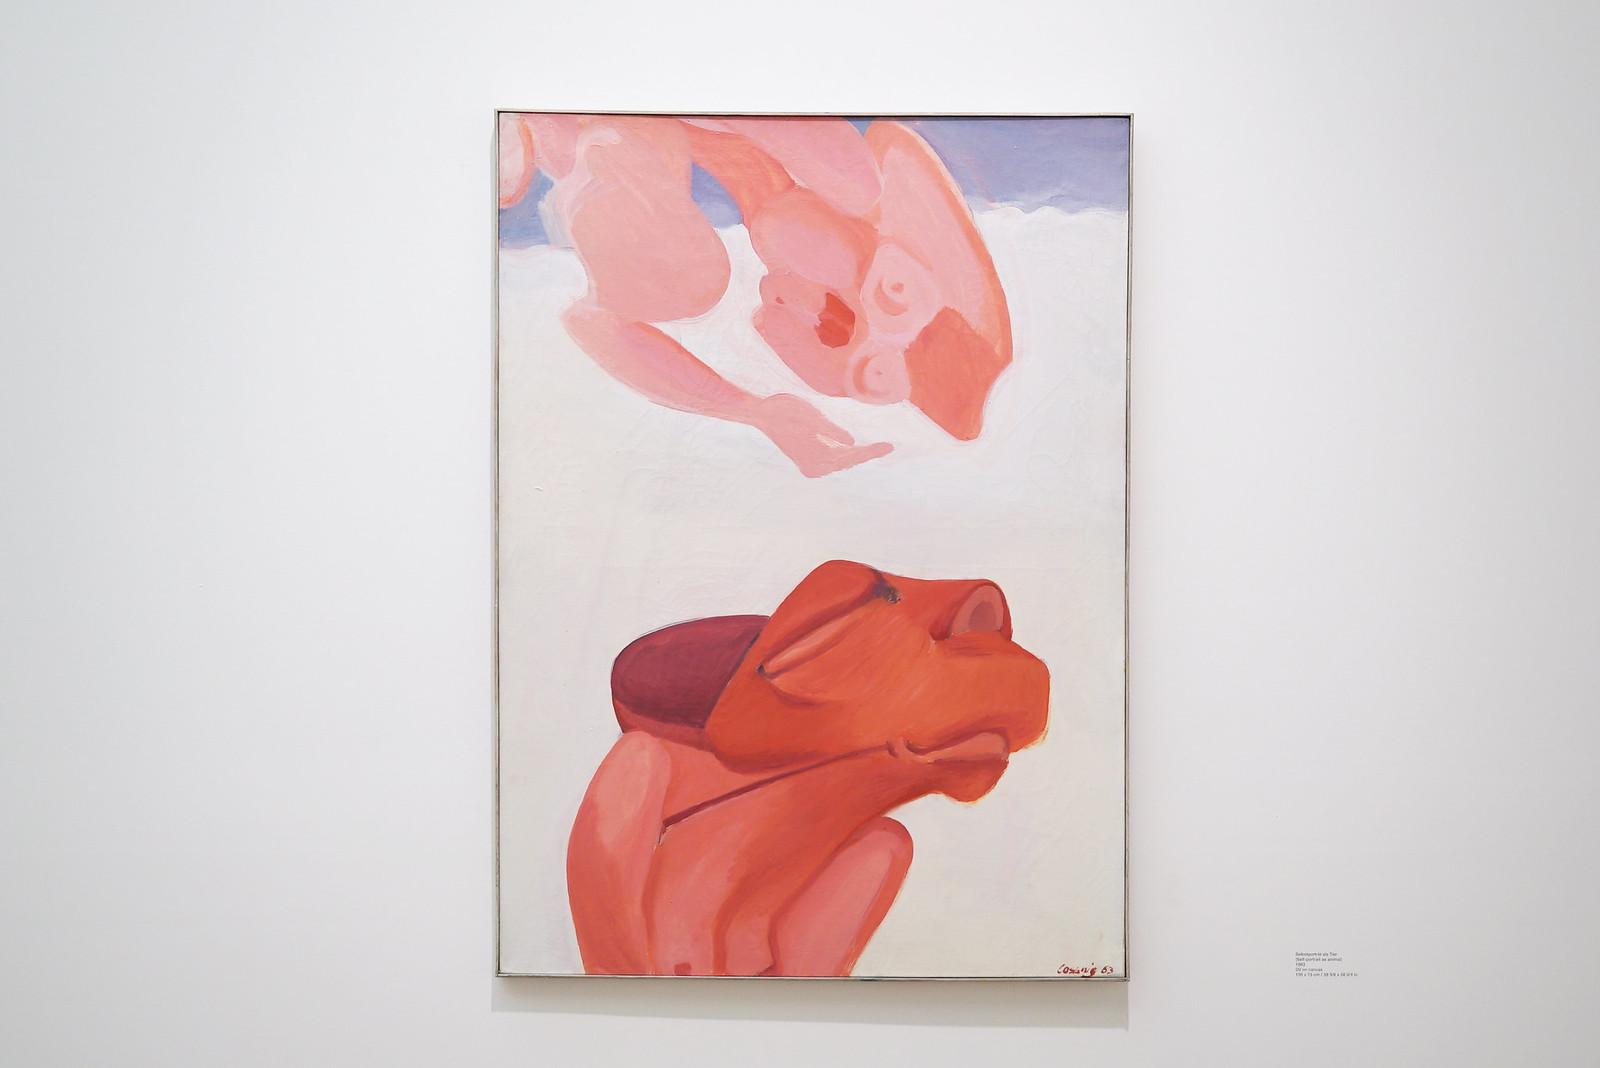 Maria Lassnig at Hauser & Wirth London